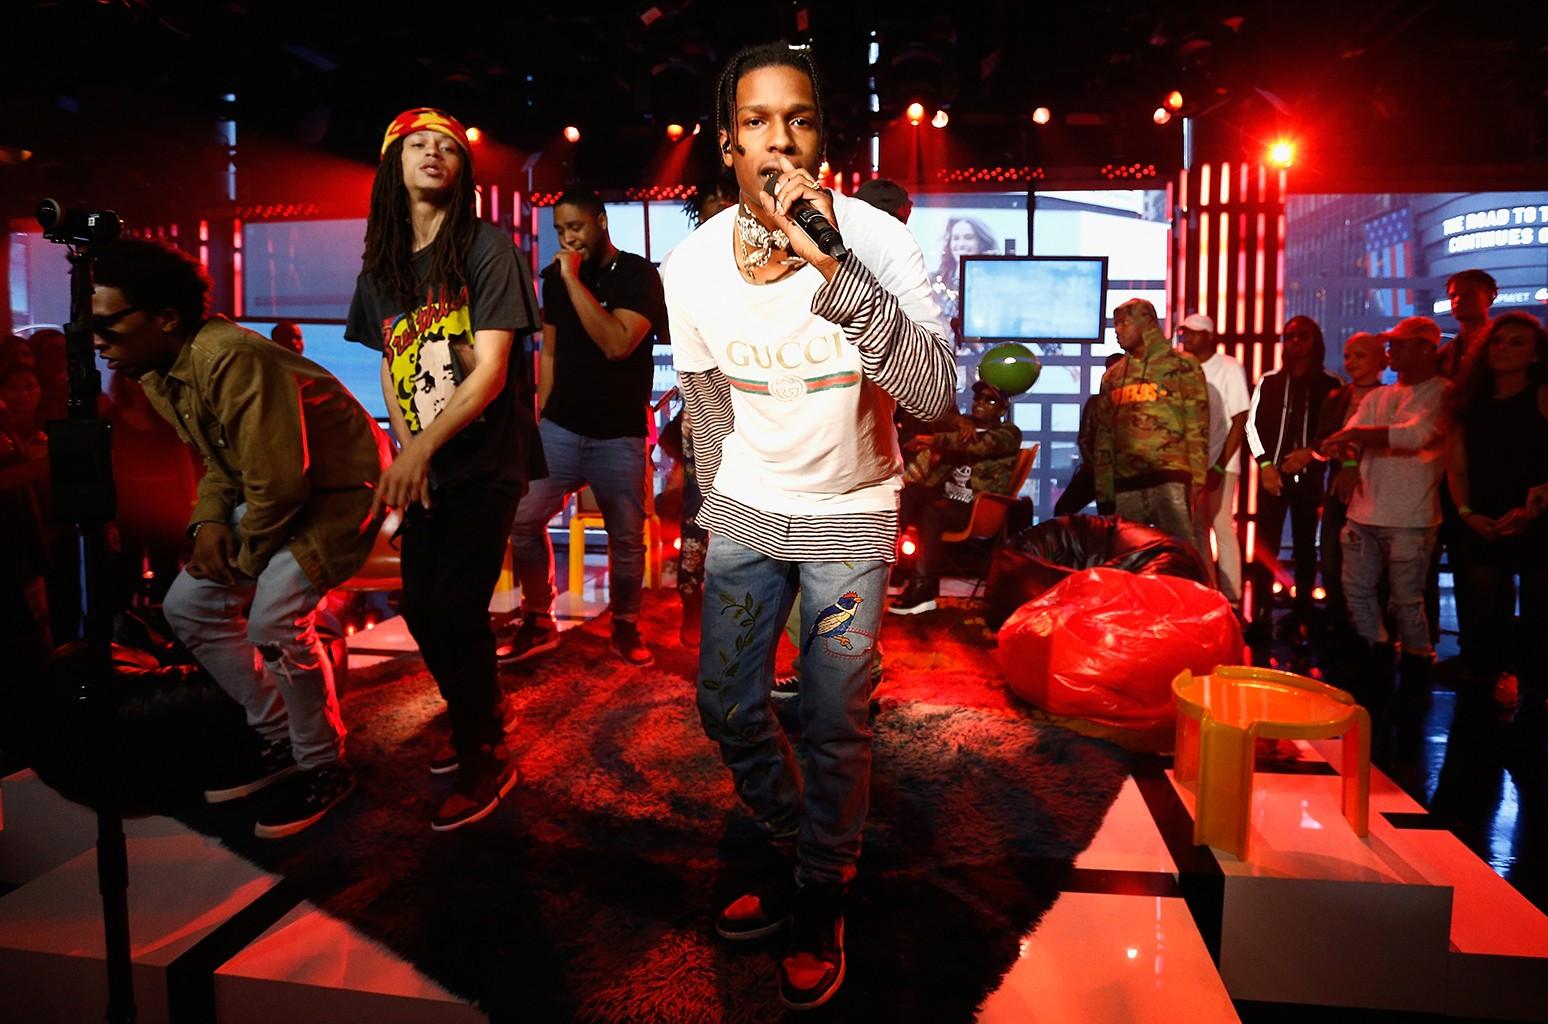 A$AP Rocky and A$AP Mob